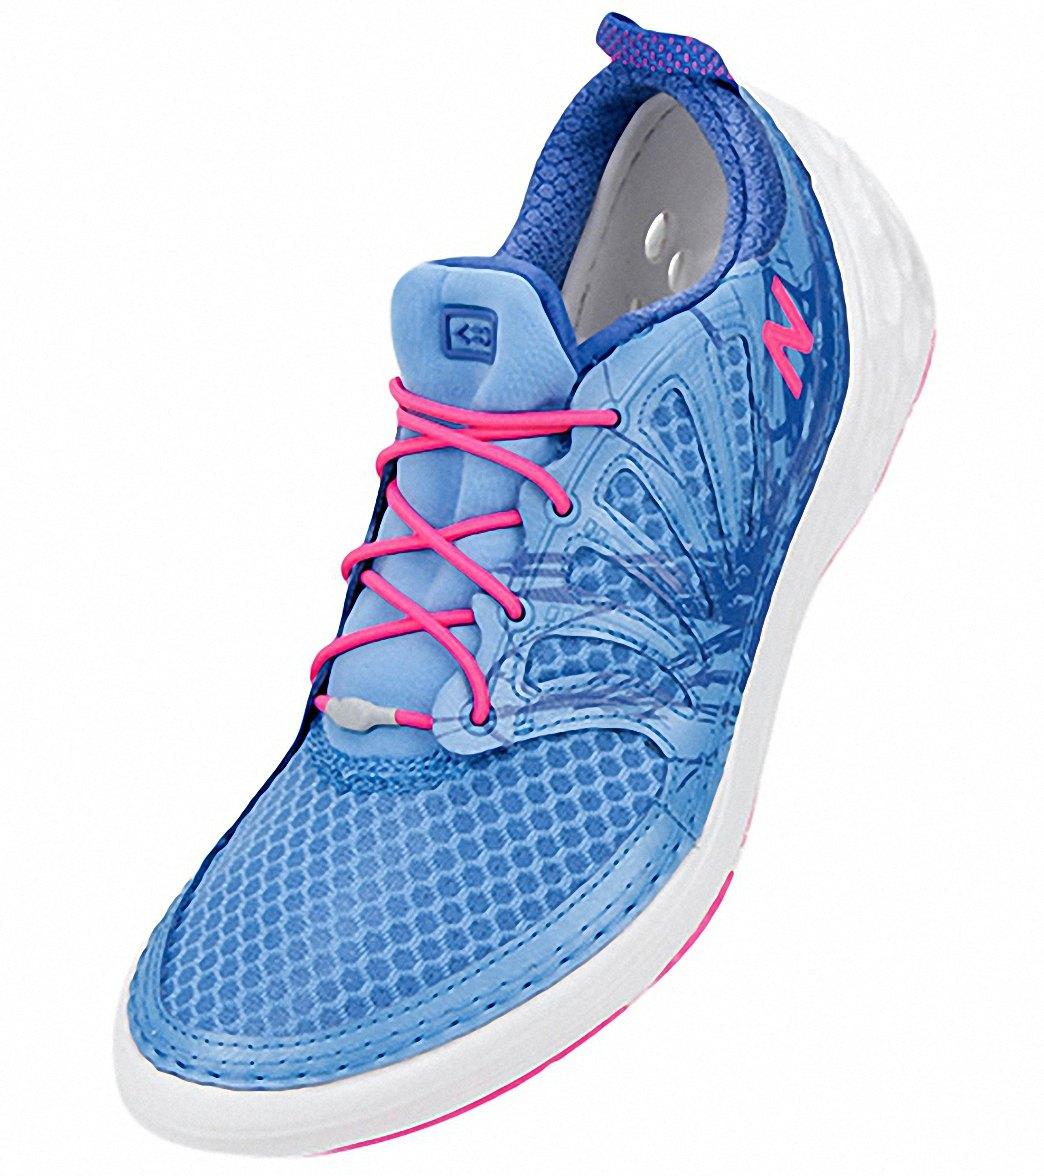 b178d75fb0ca New Balance Women s 70 Minimus Water Shoes at SwimOutlet.com ...